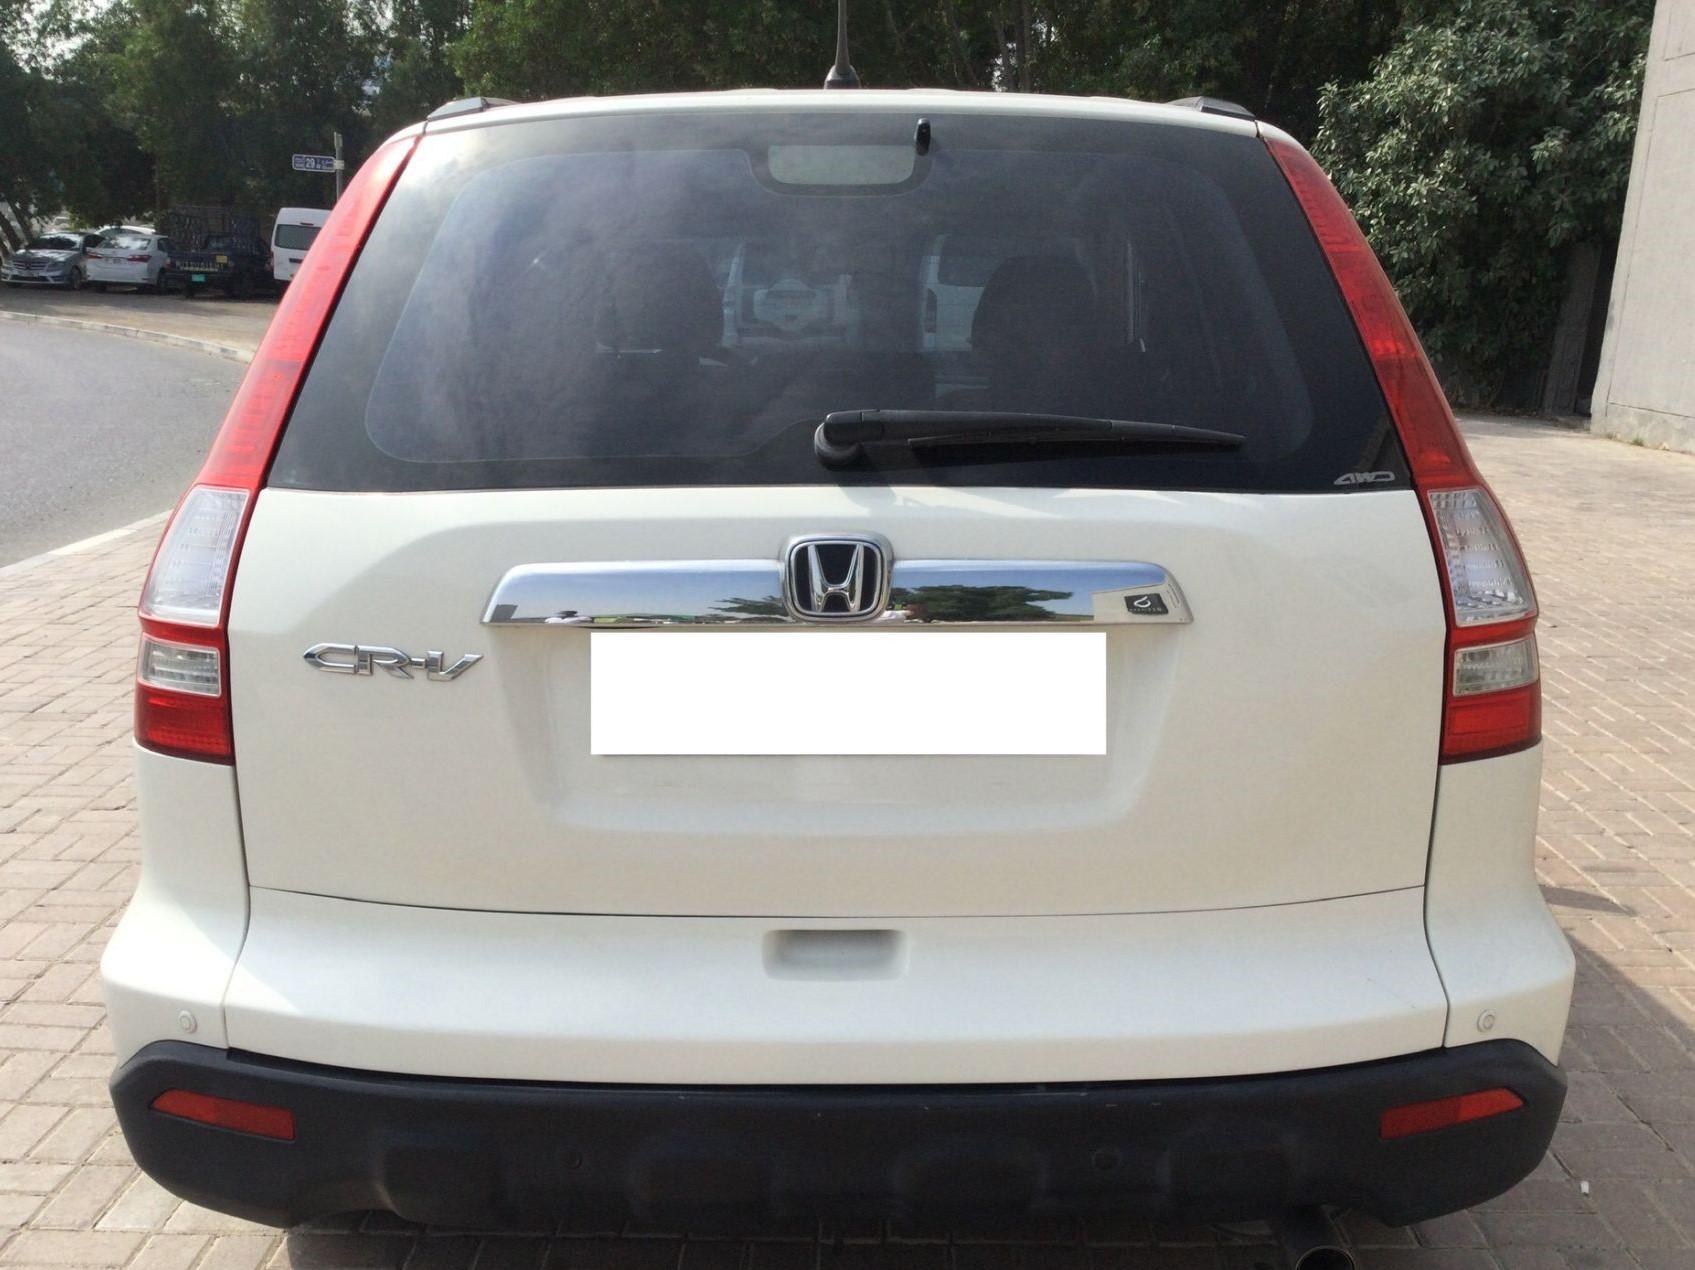 Honda CR-V 2007 - Image 3